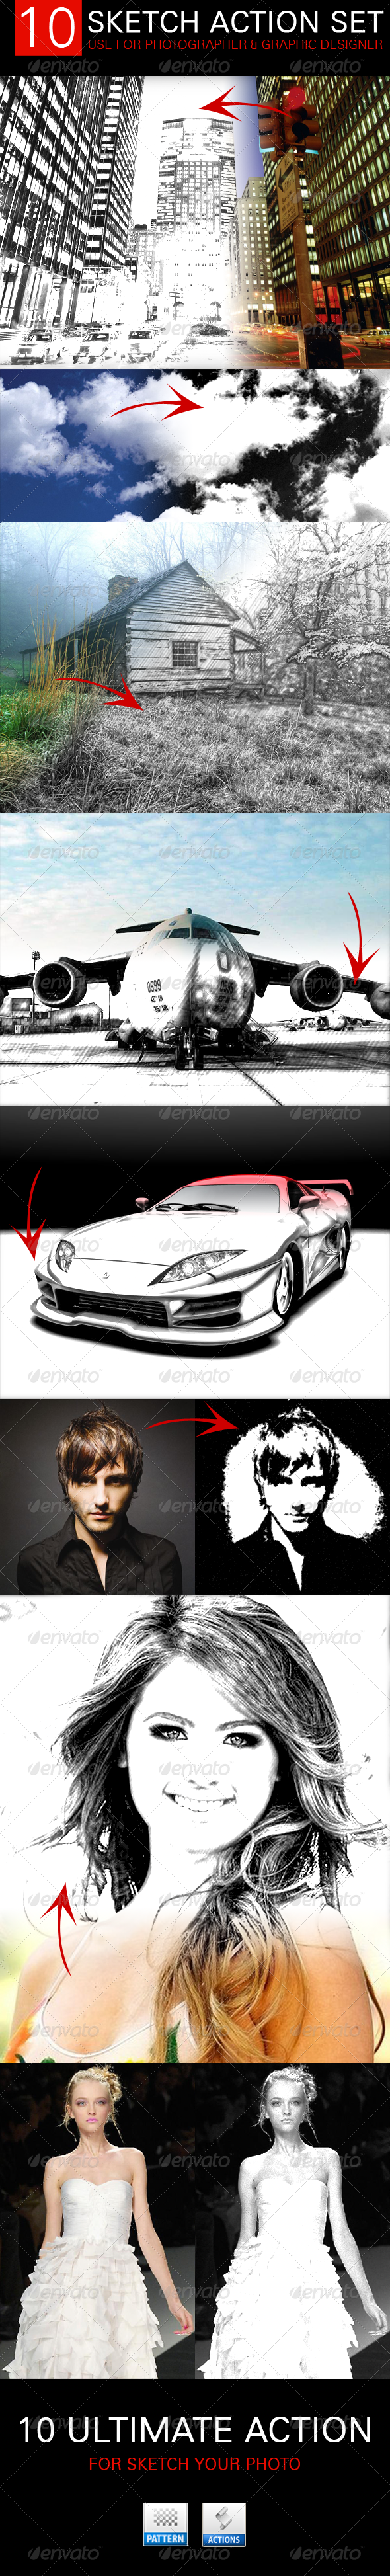 GraphicRiver 10 Ultimate Action Pencil Sketch 5564081